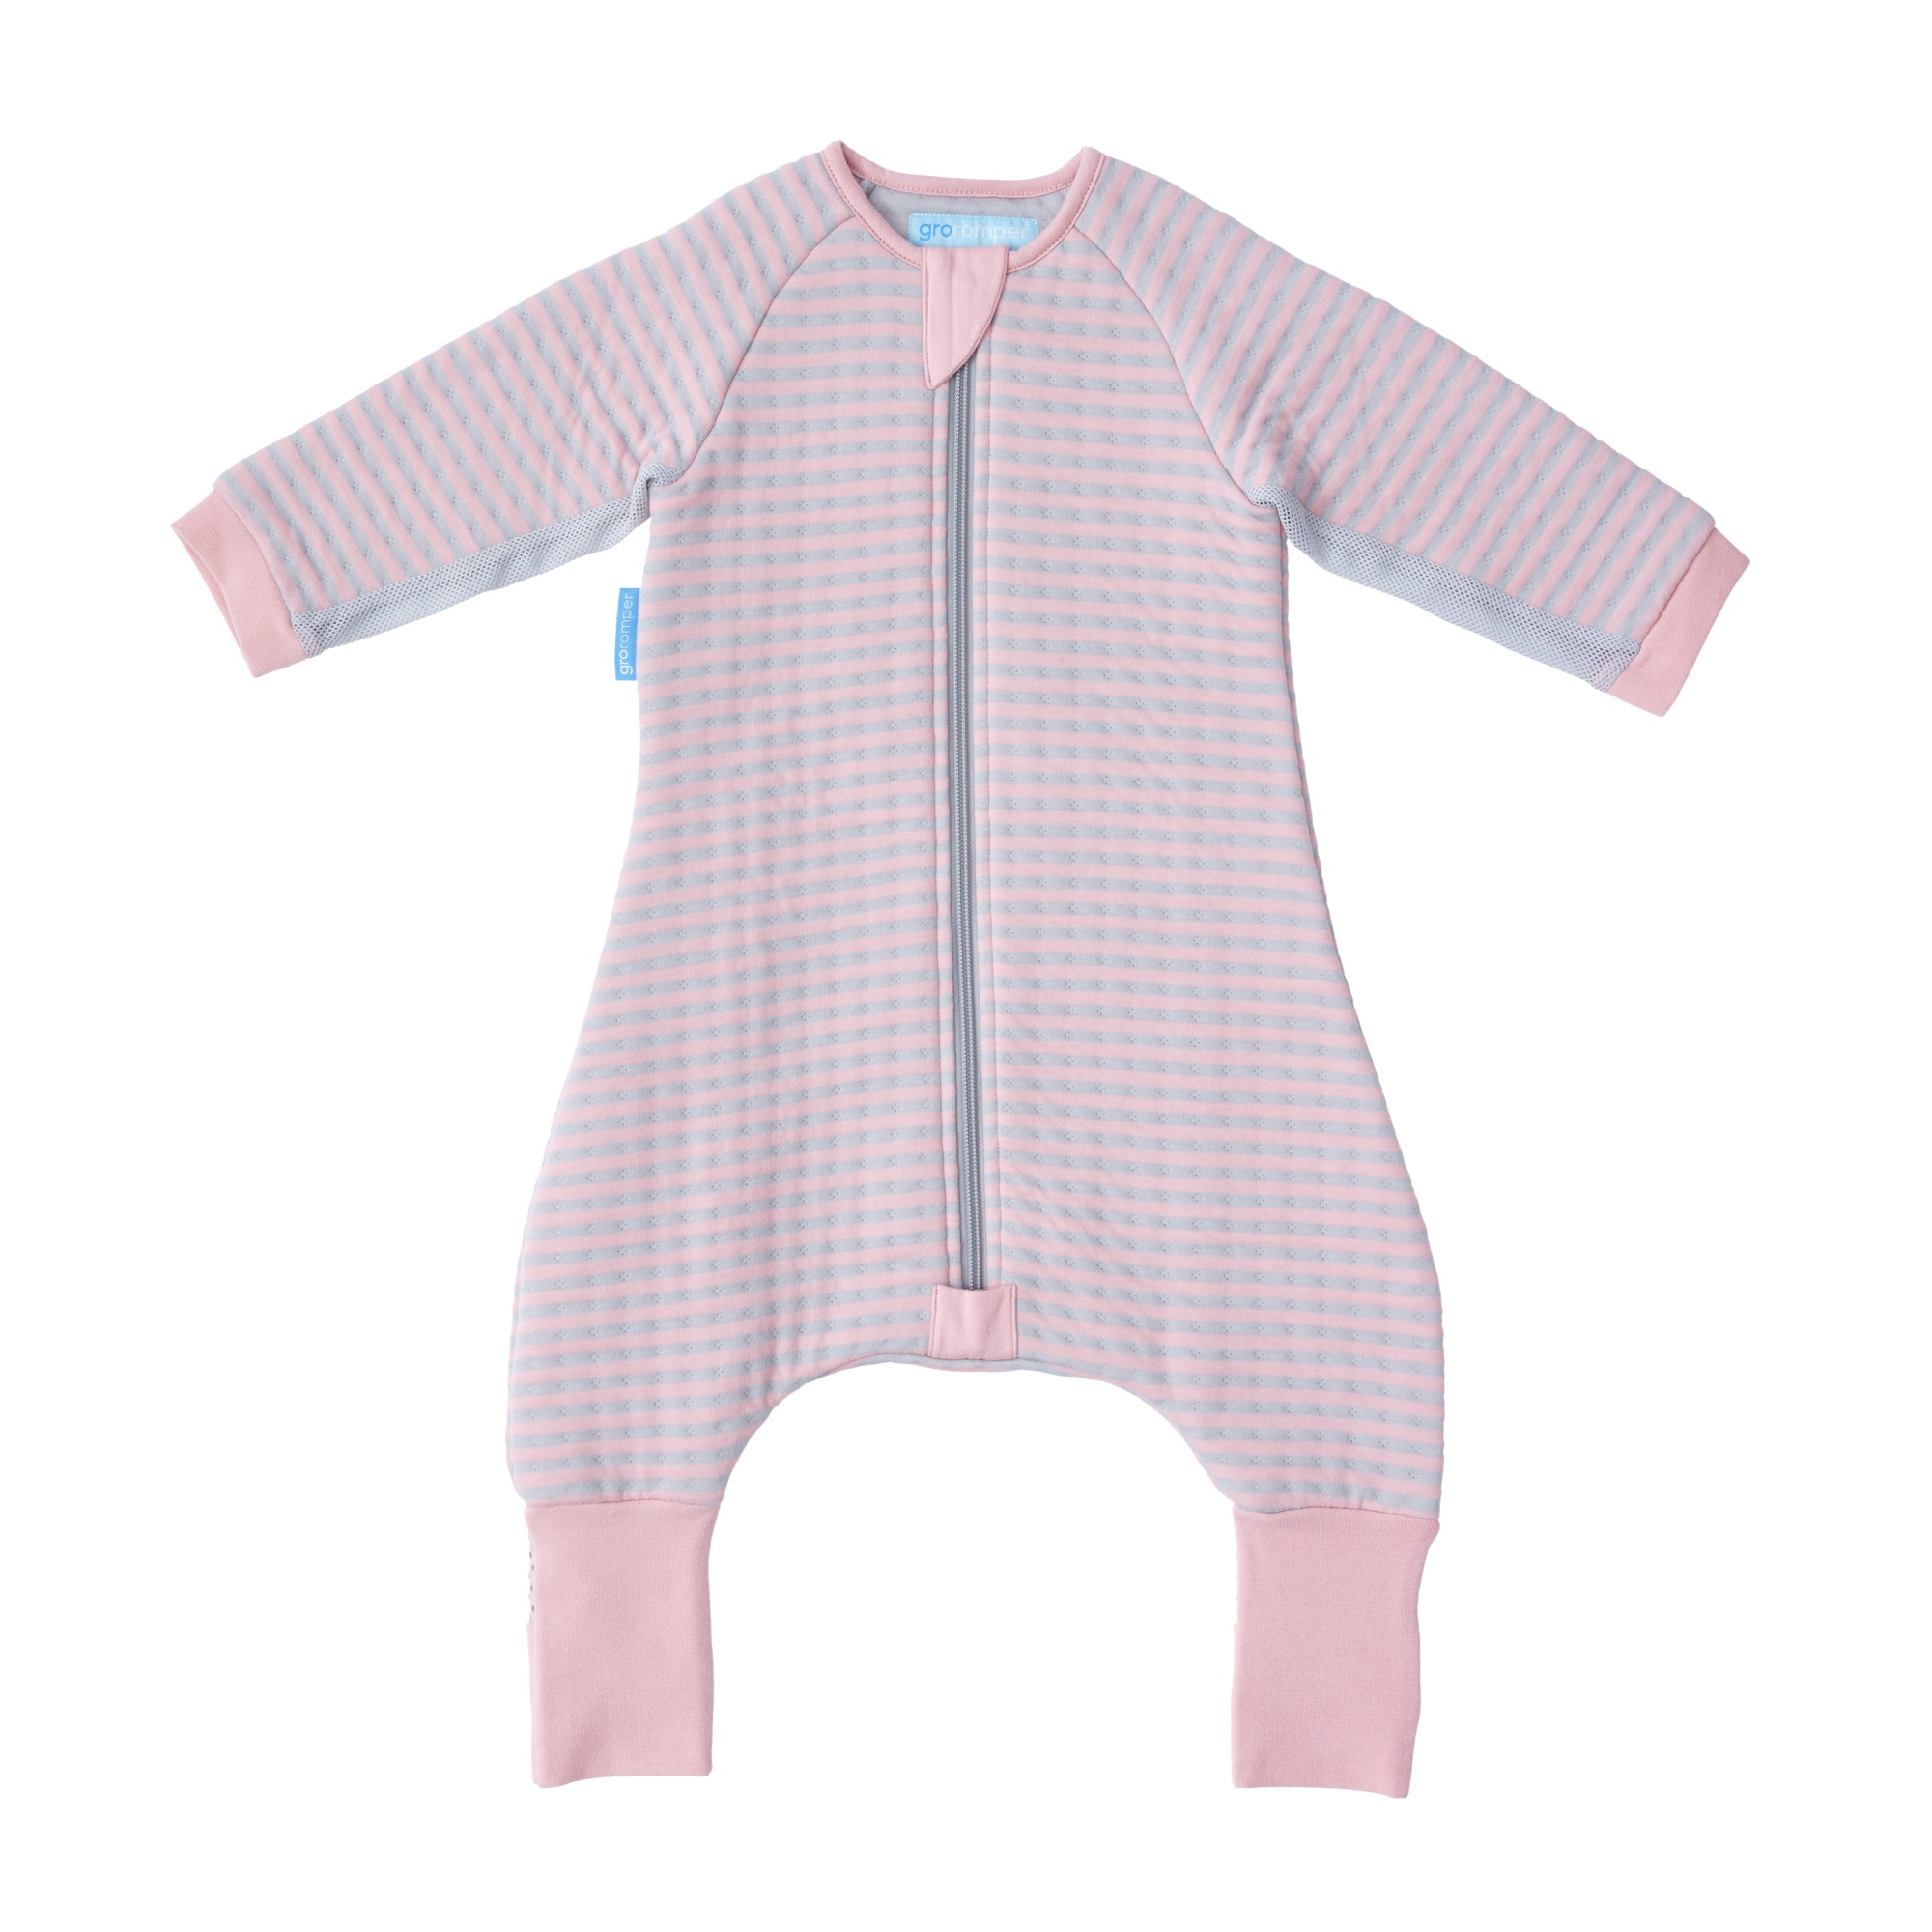 Body pentru Bebelusi Gros, Dungi roz, 24 - 36 luni, Gro